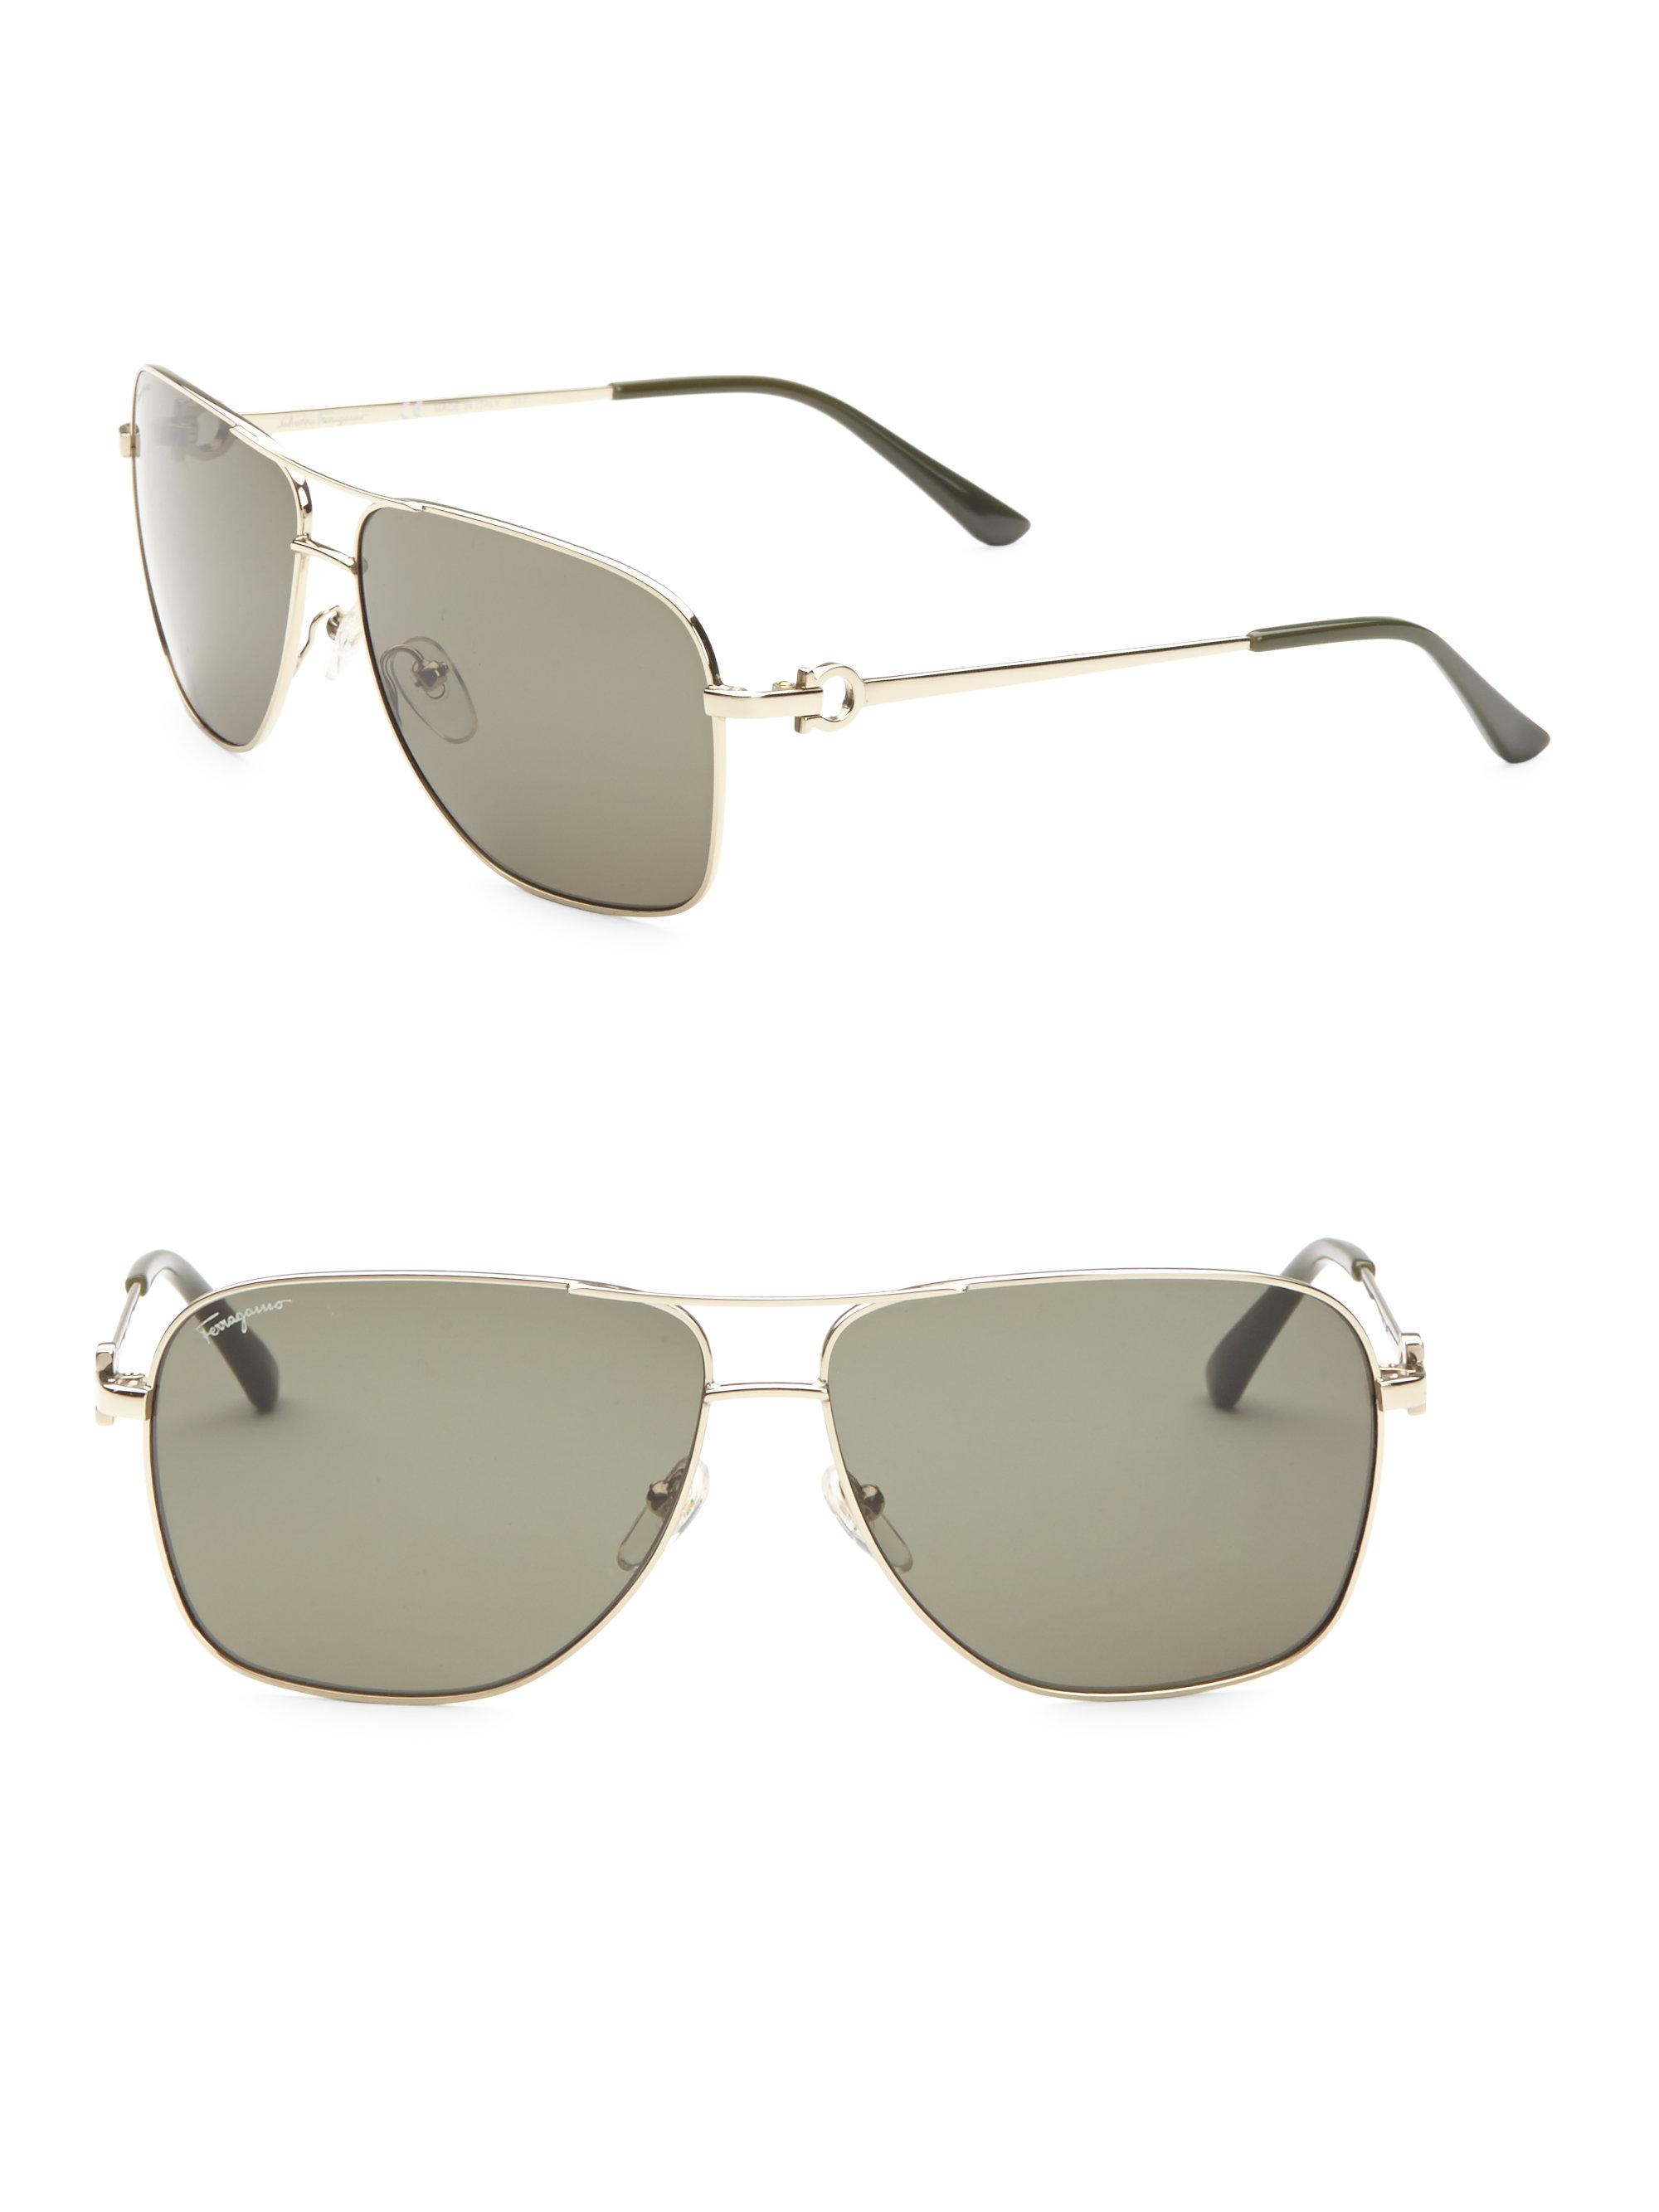 d43631d85d Lyst - Ferragamo Aviator Sunglasses in Metallic for Men